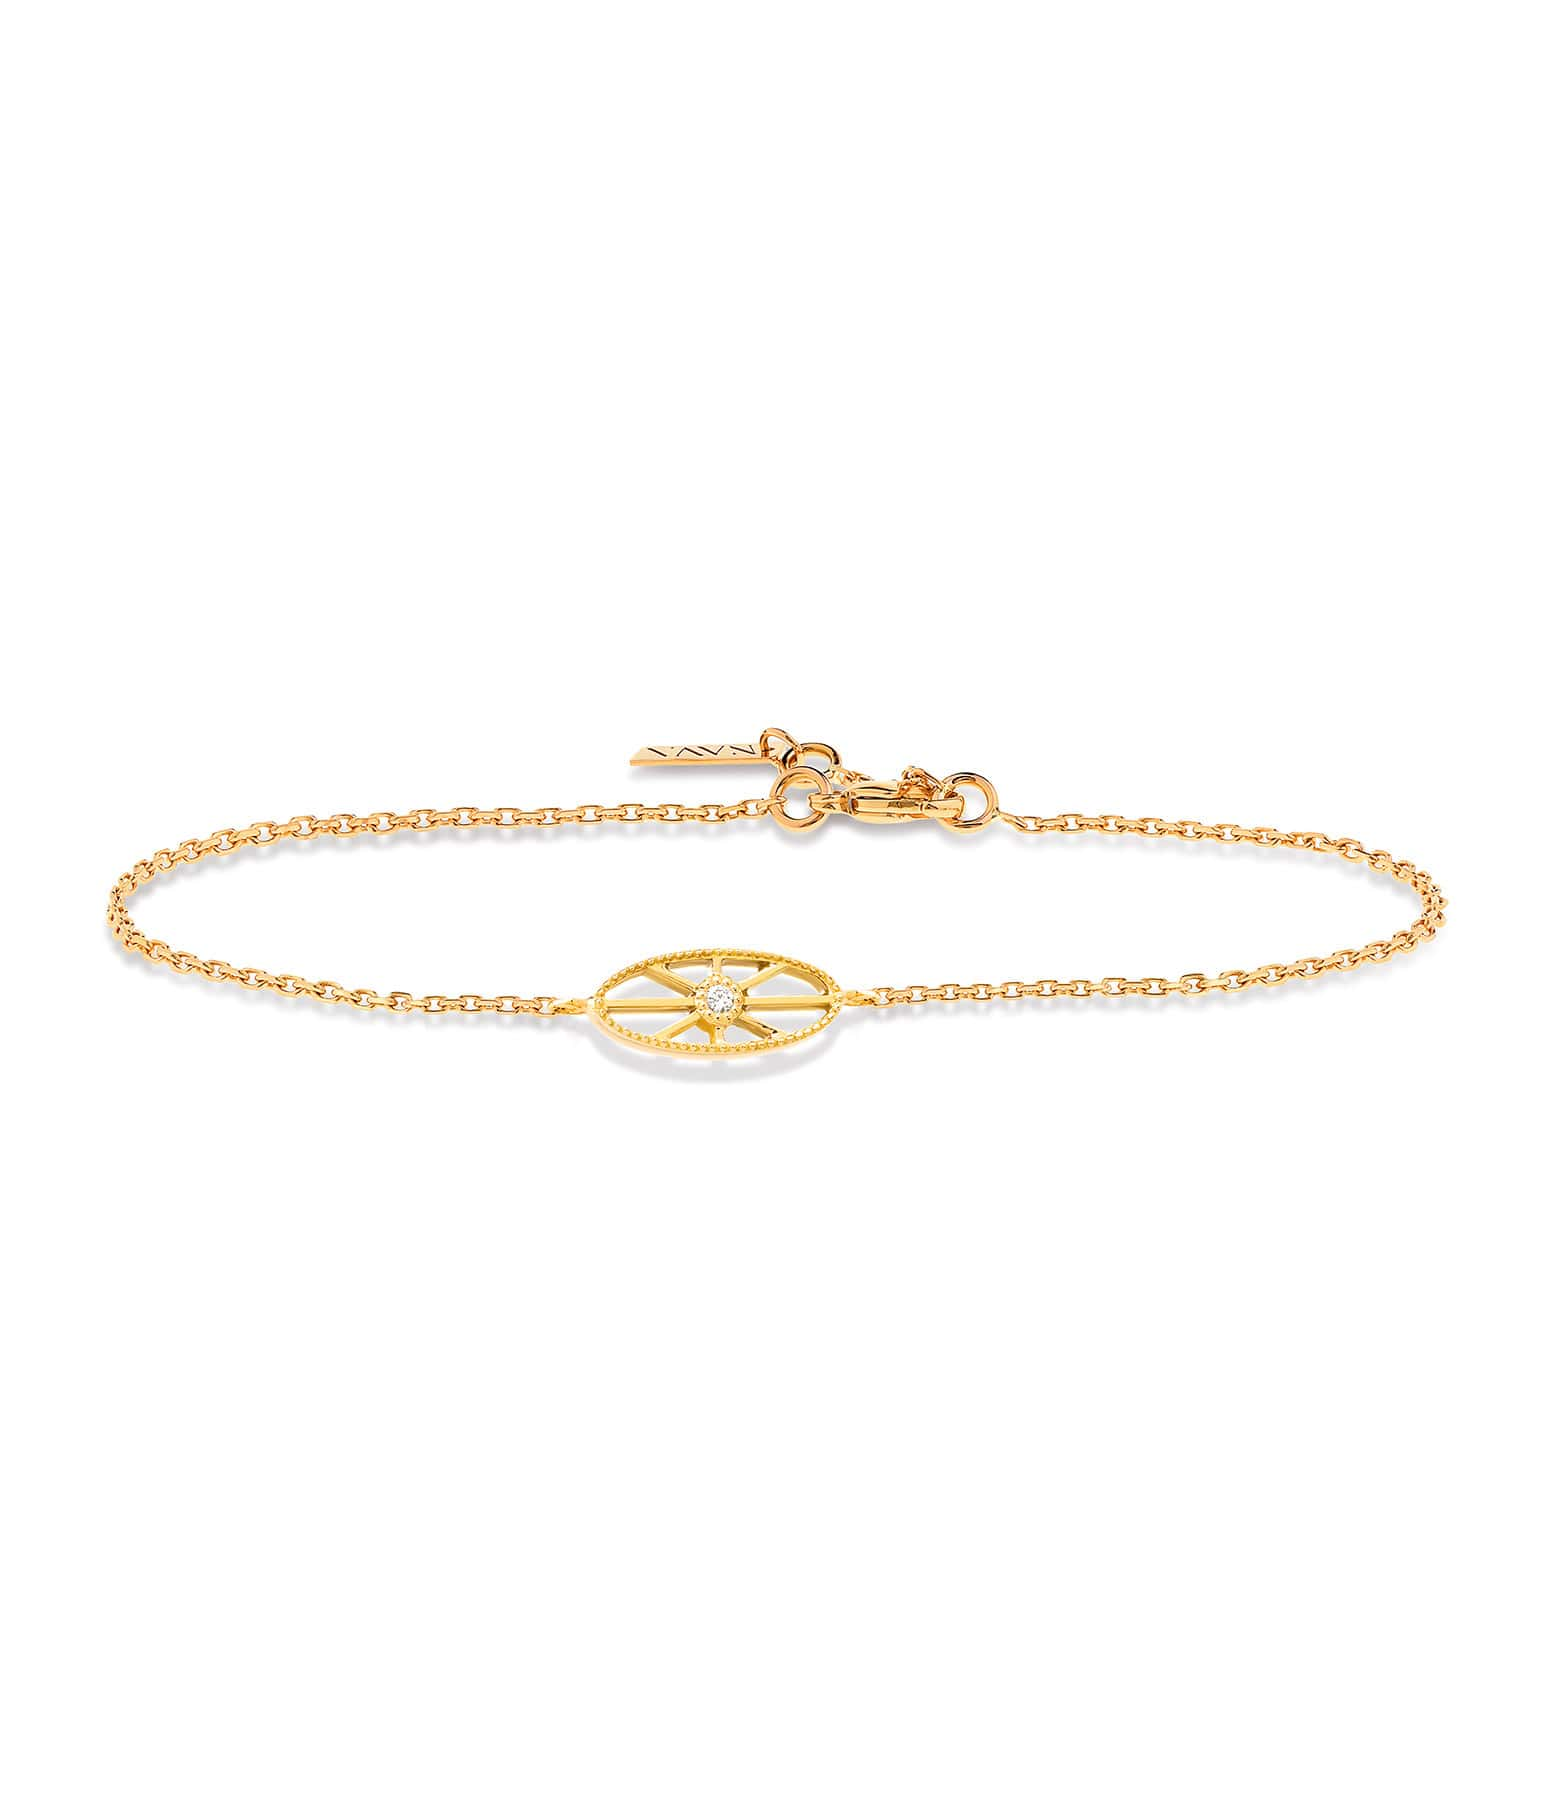 NAVA JOAILLERIE - Bracelet Cheyenne Ovale Or Jaune